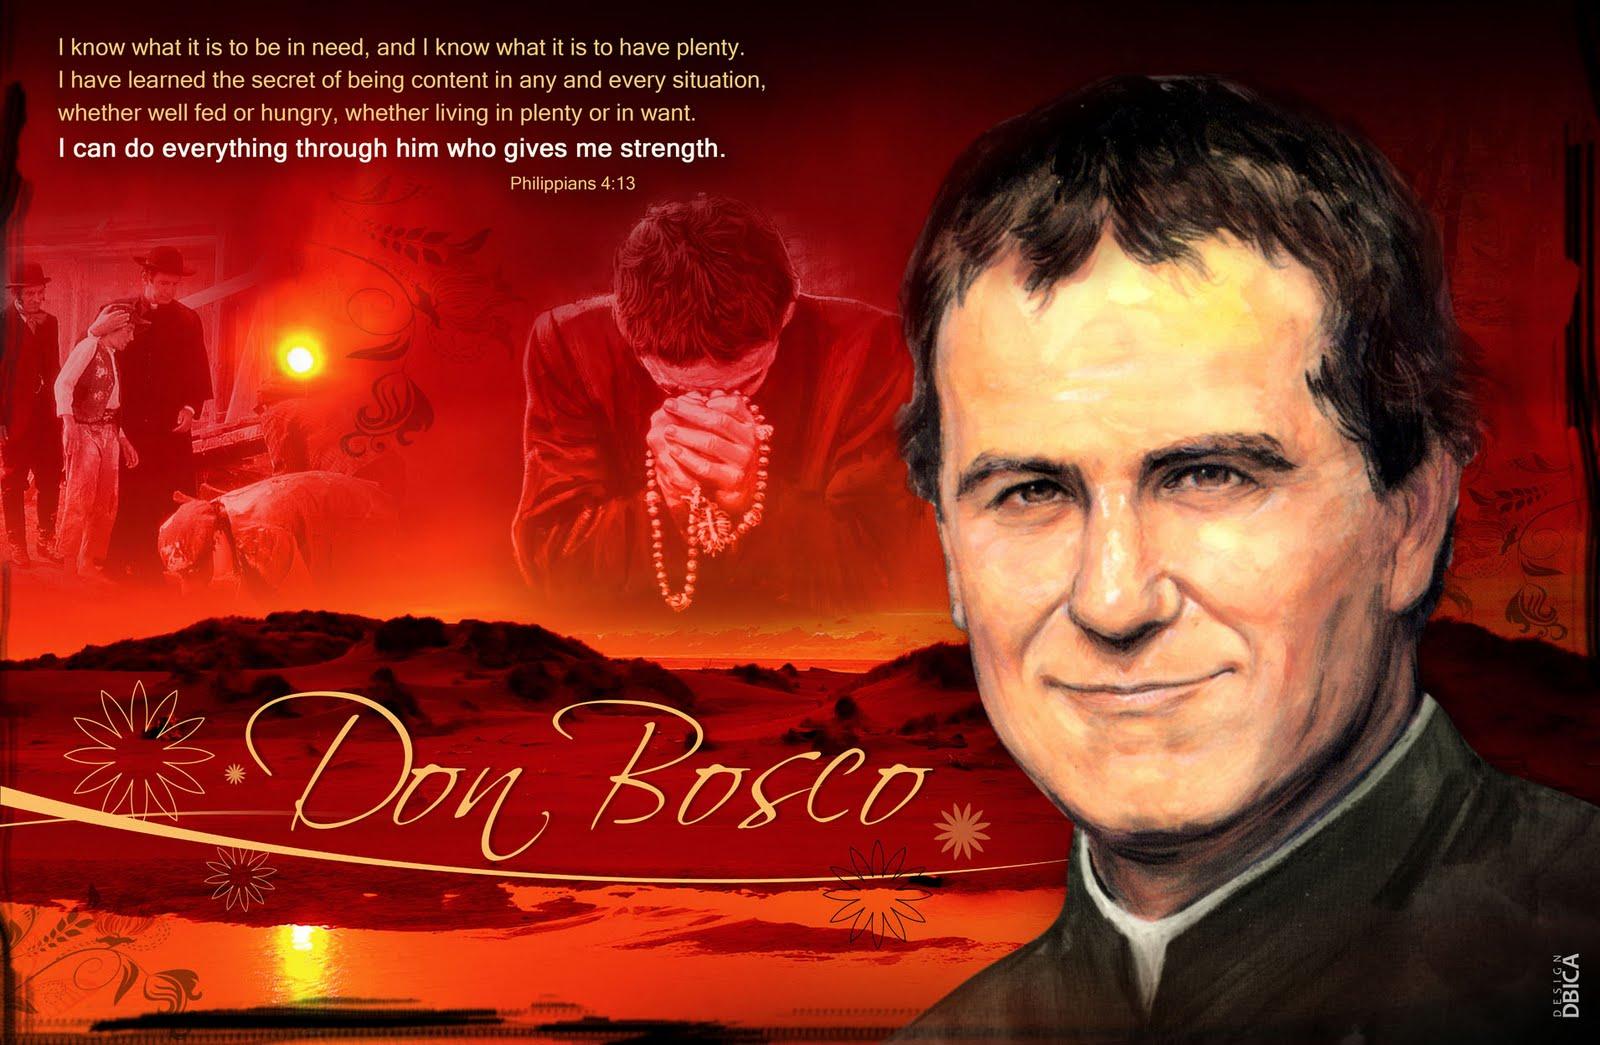 Don Bosco: St John's KONDADABA: Feast Of Don Bosco